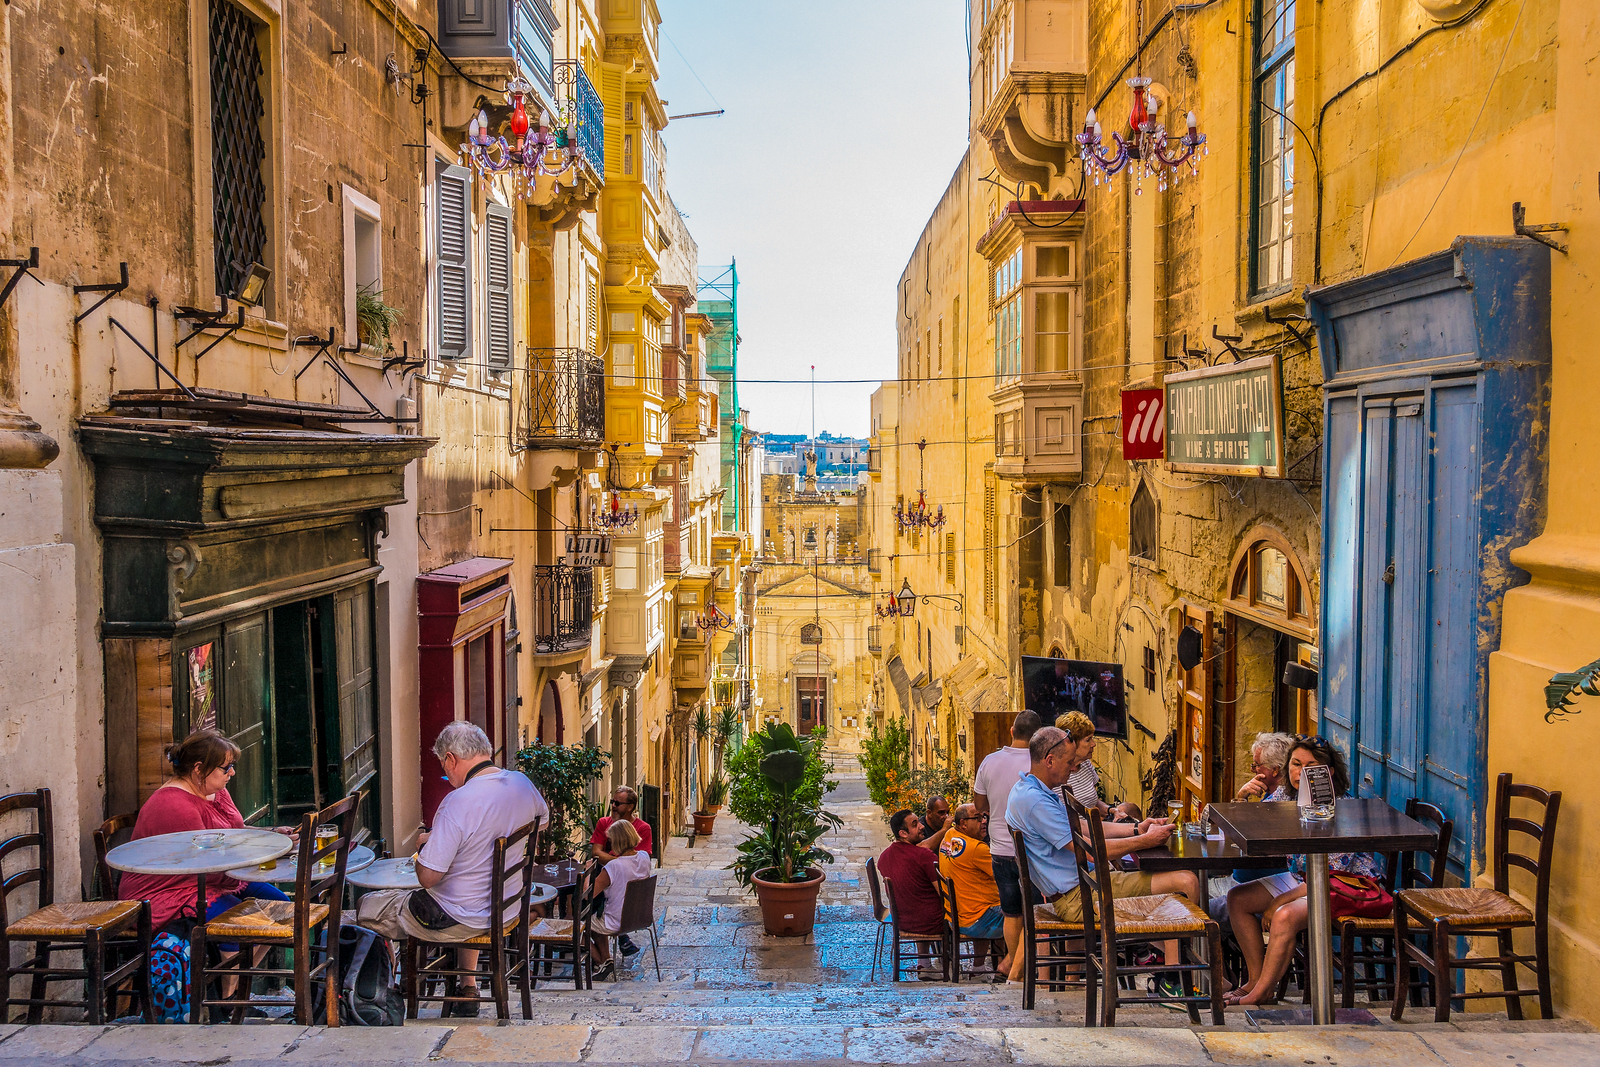 3 days in Malta - Valletta